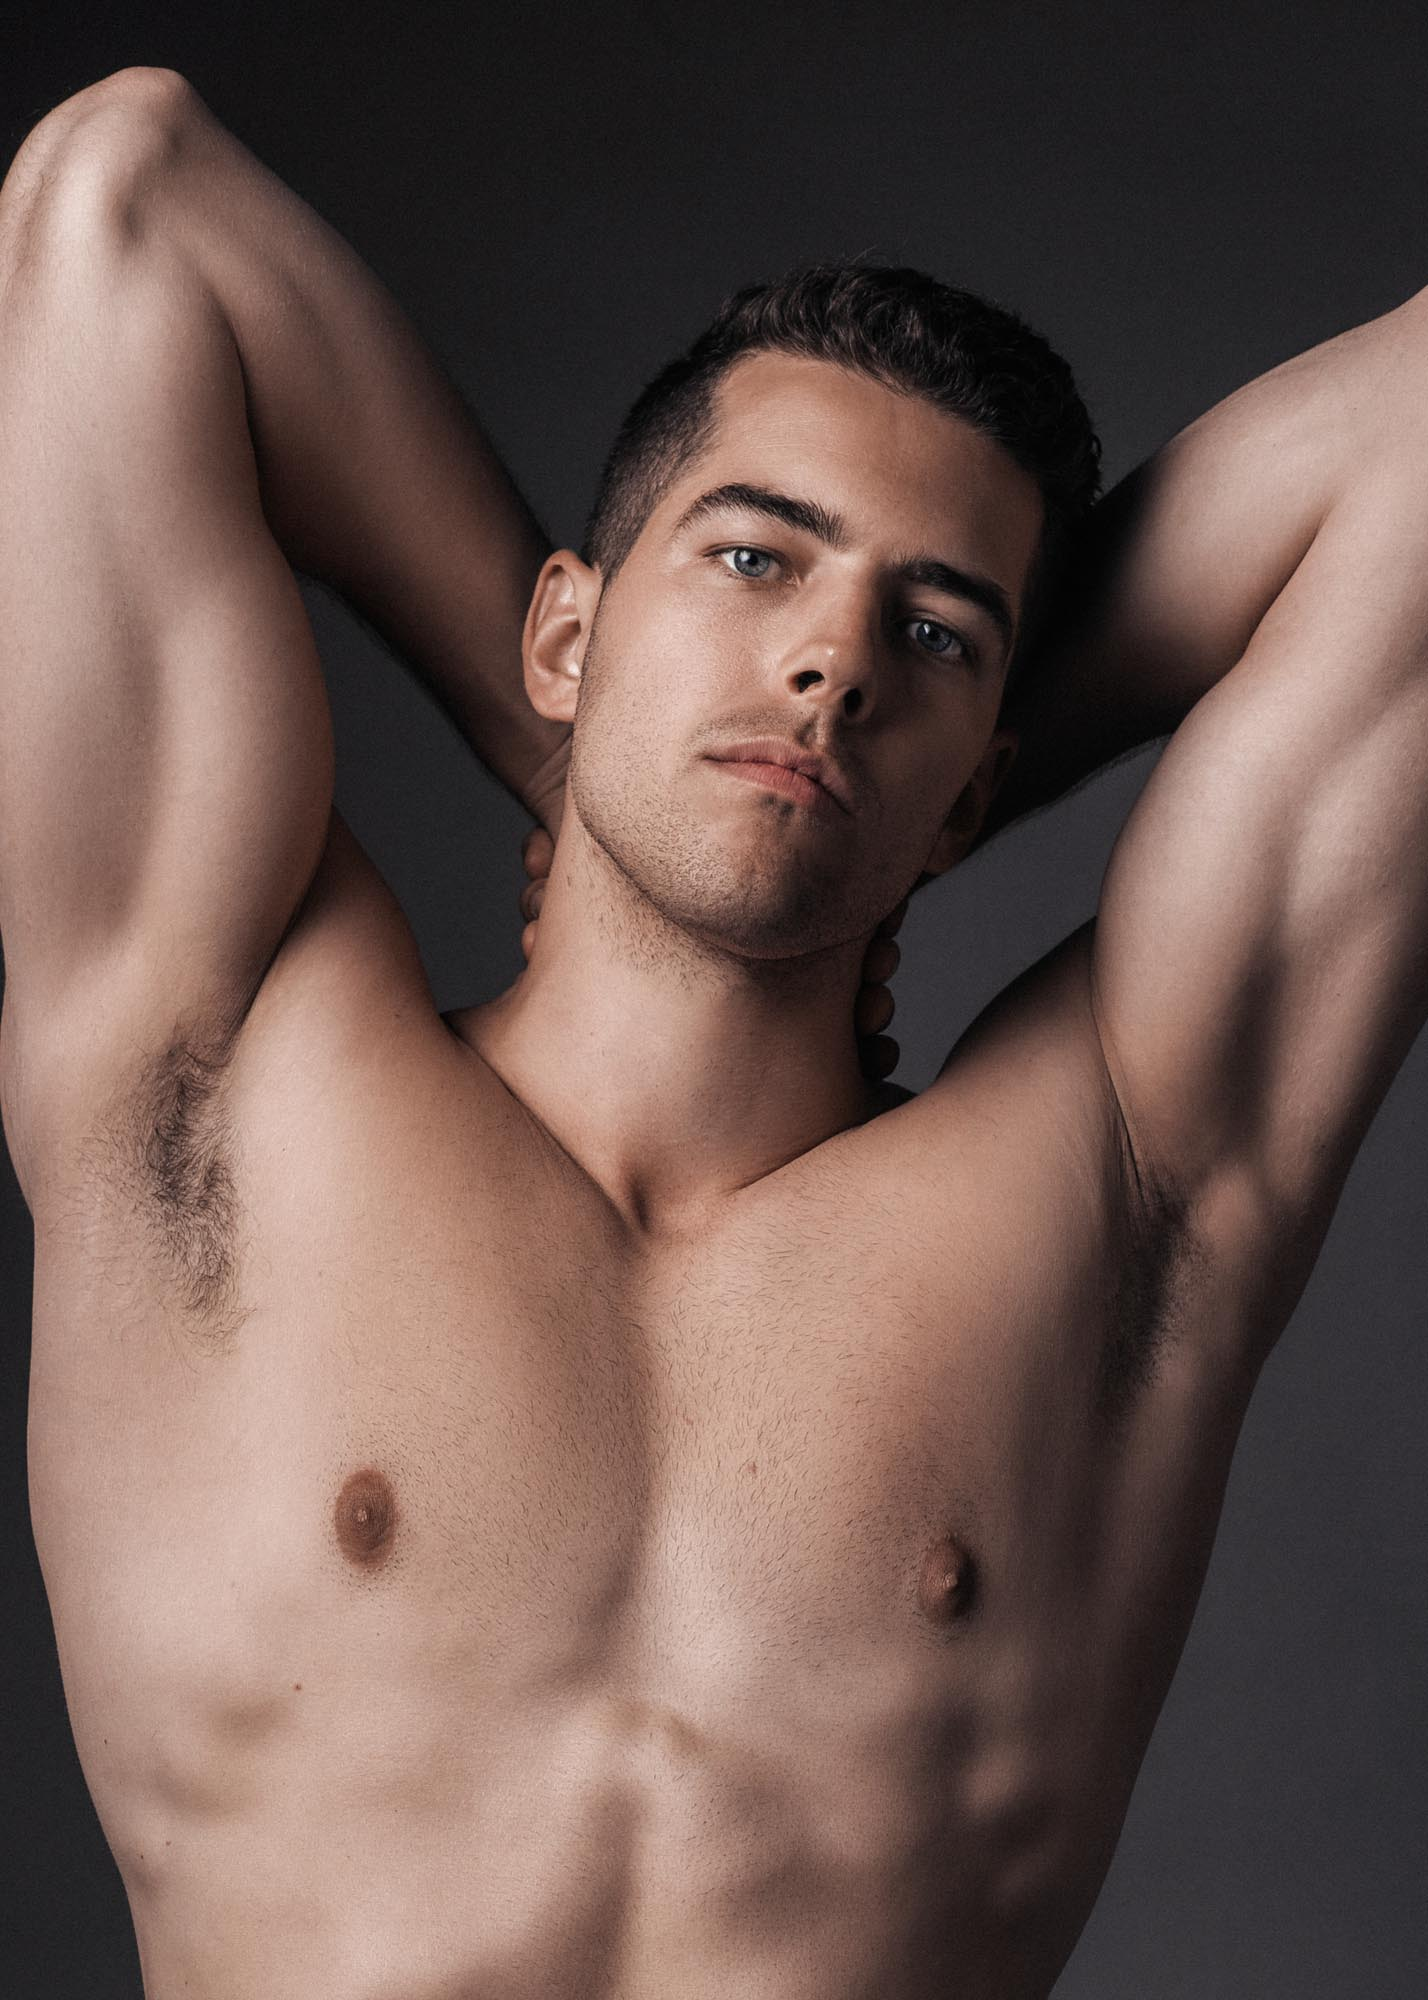 nyc-photographers-male-model-test-10006.jpg